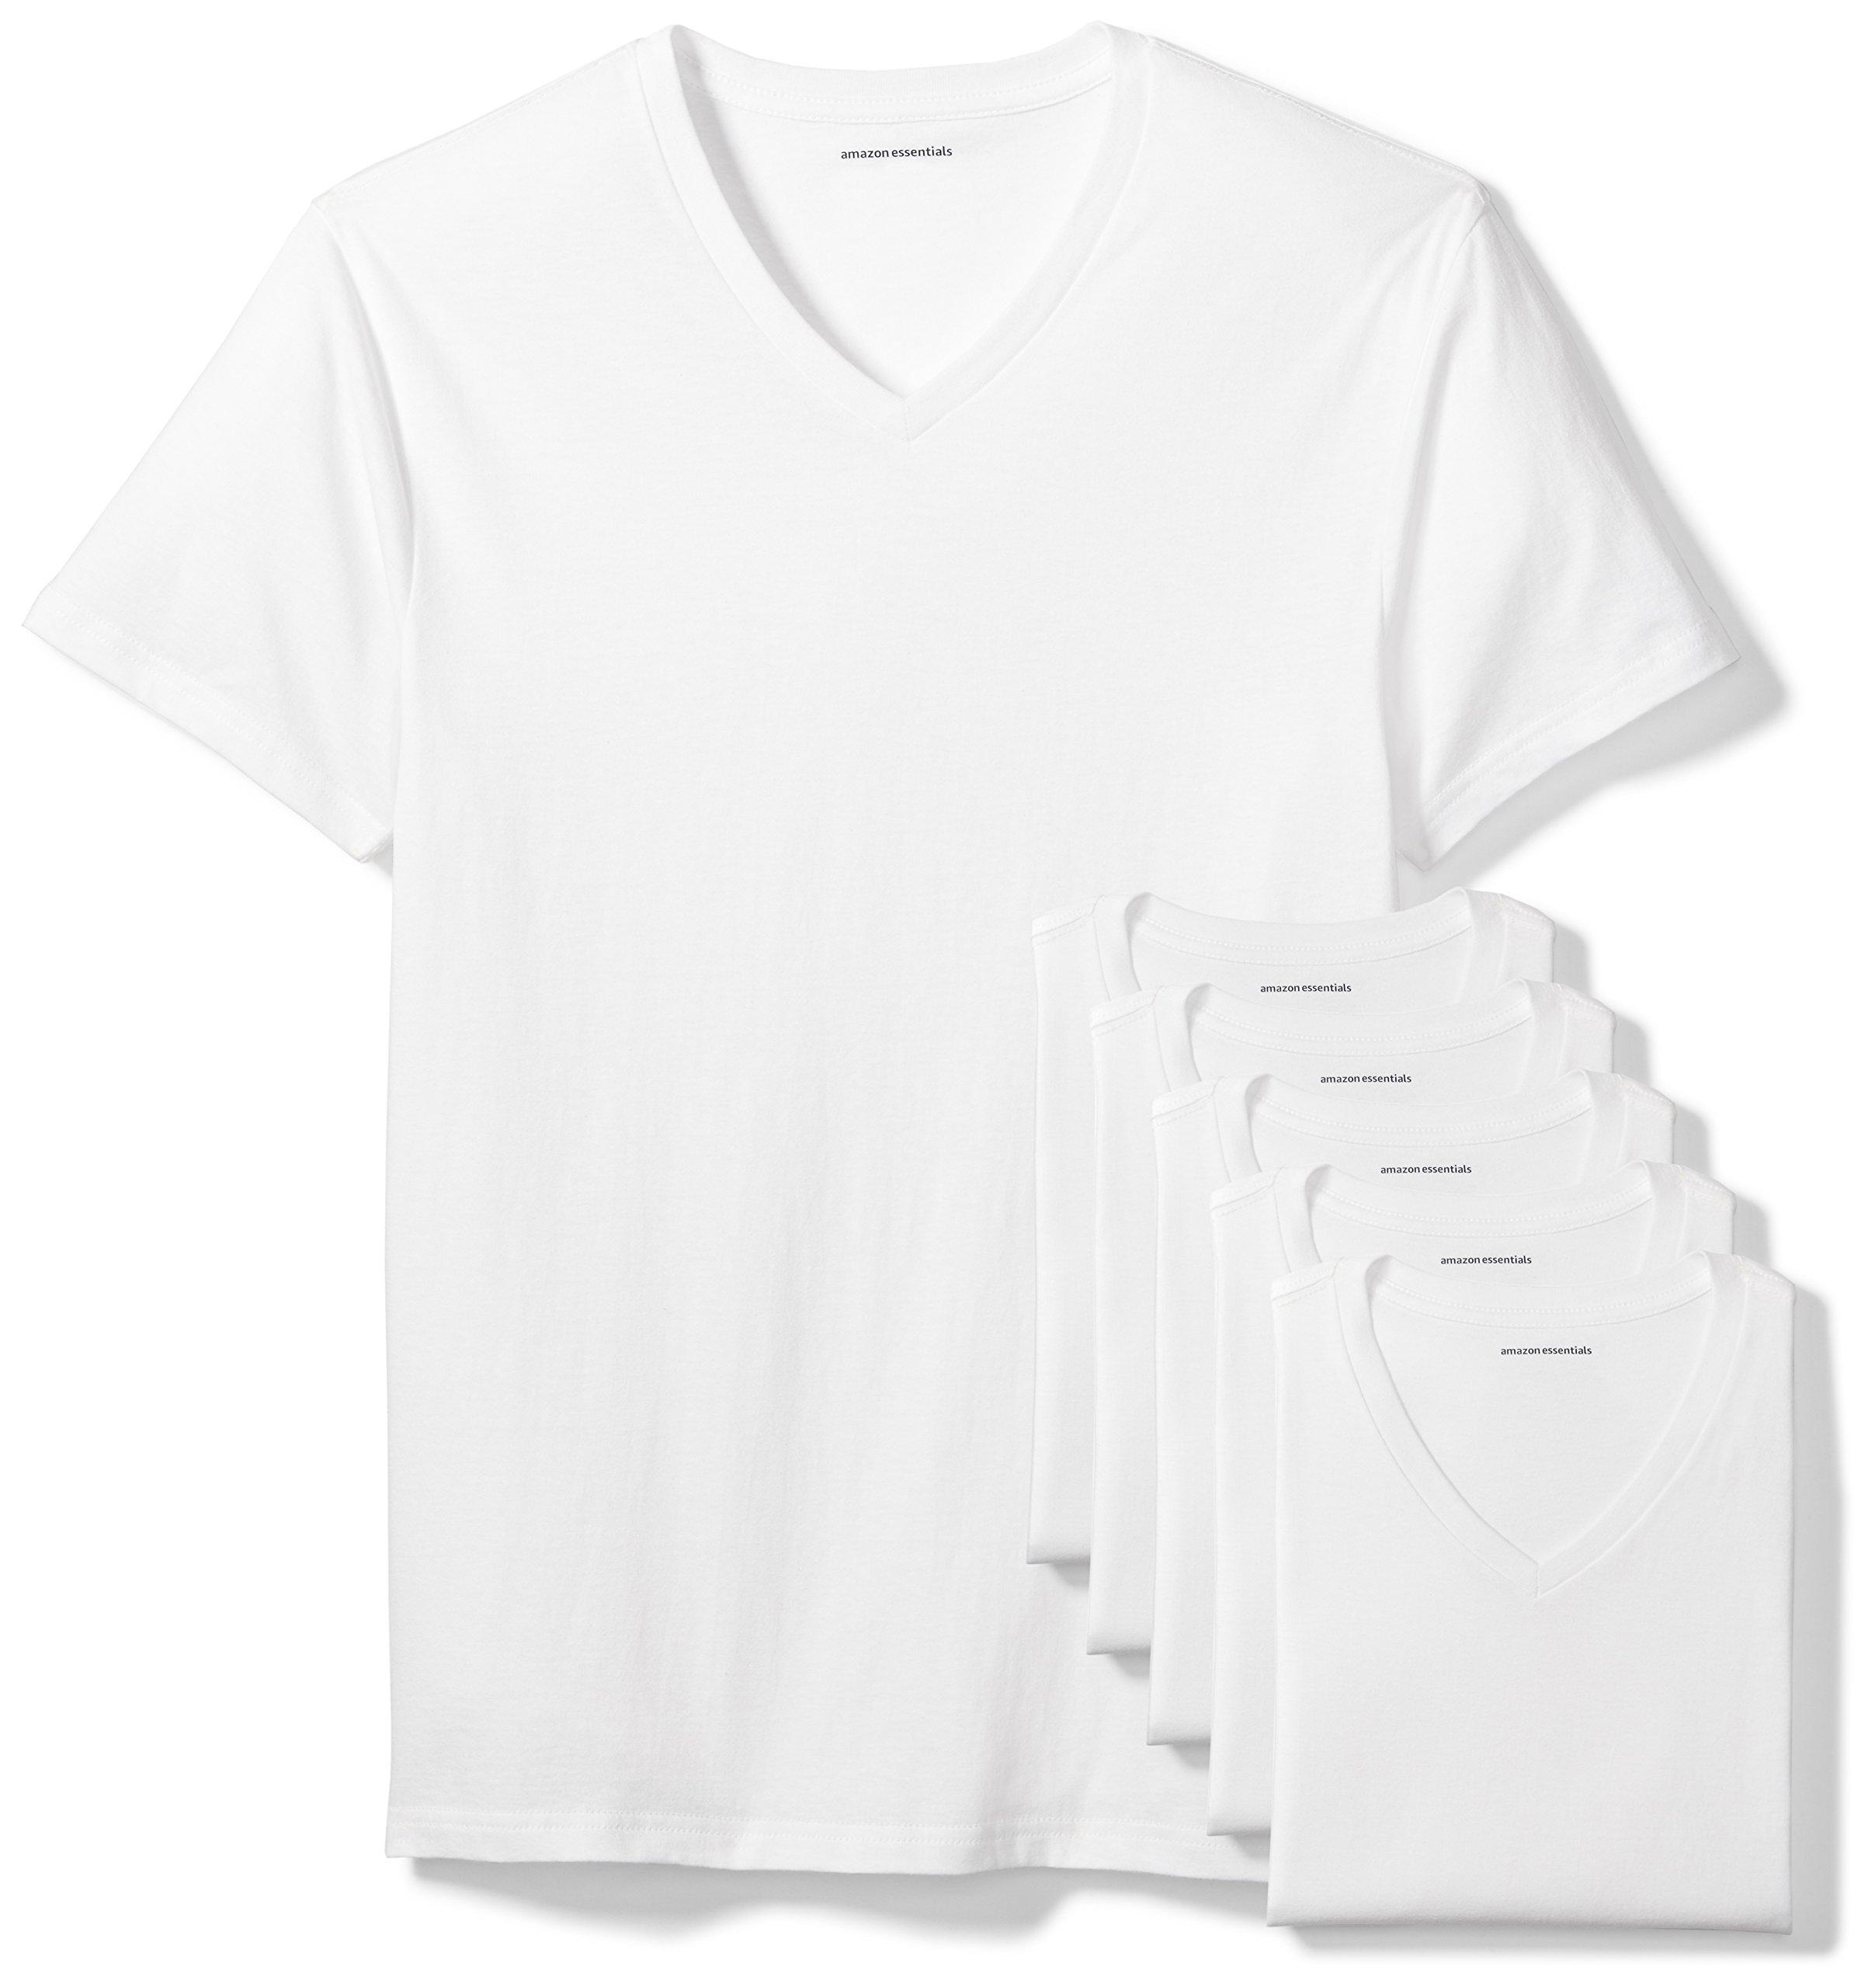 Amazon Essentials Men's 6-Pack V-Neck Undershirts, White, Large by Amazon Essentials